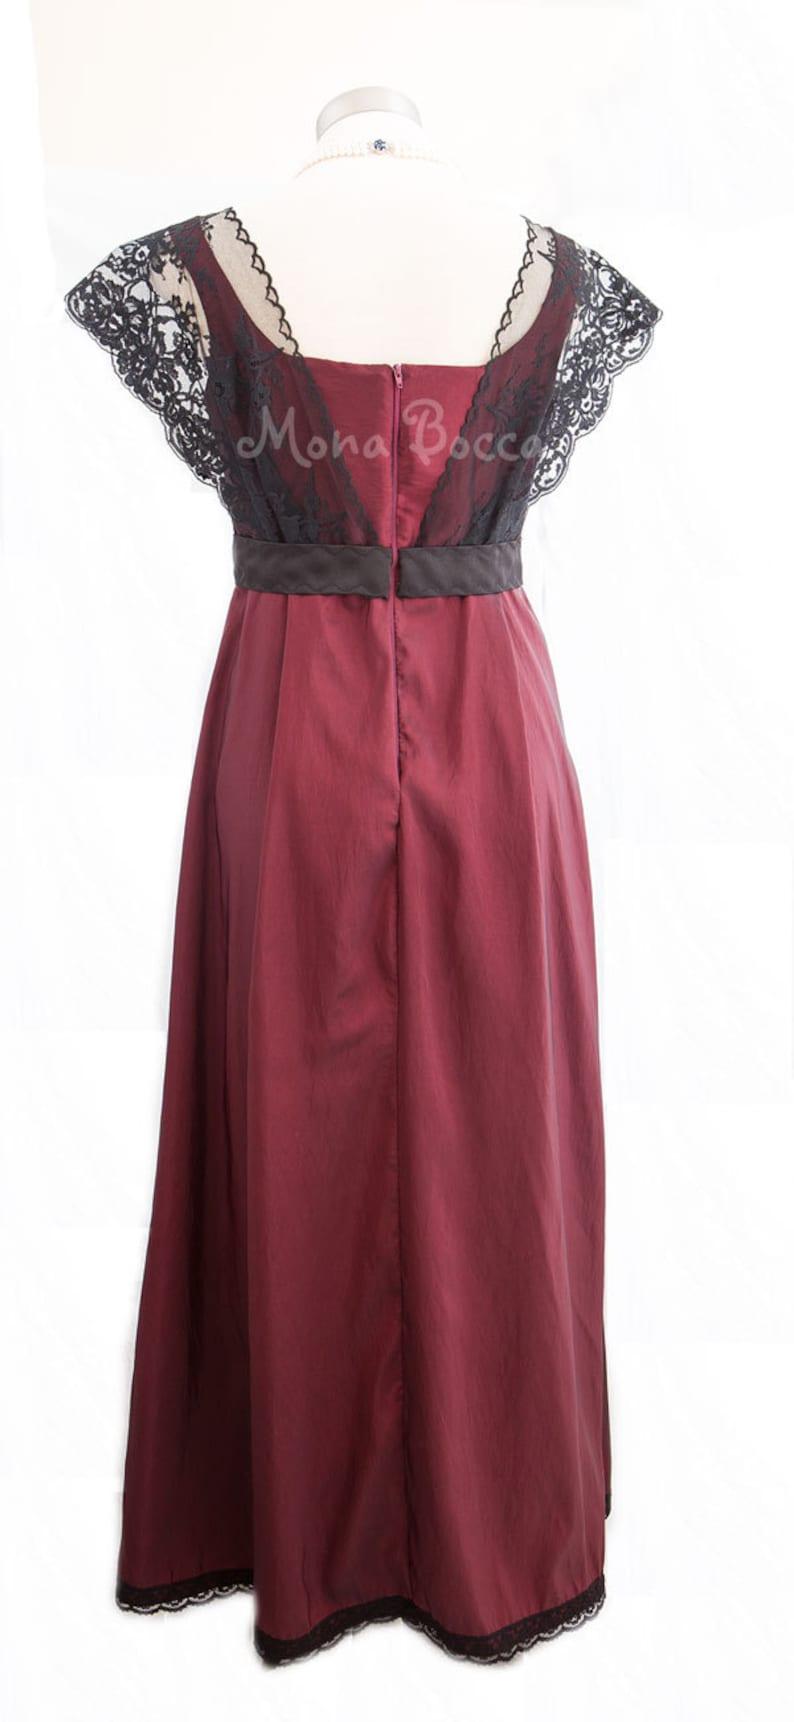 Edwardian dress Downton Abbey Downtown Abbey Edwardian bridesmaid Titanic 1912 Rose Dewitt Bukater handmade in England Made to order